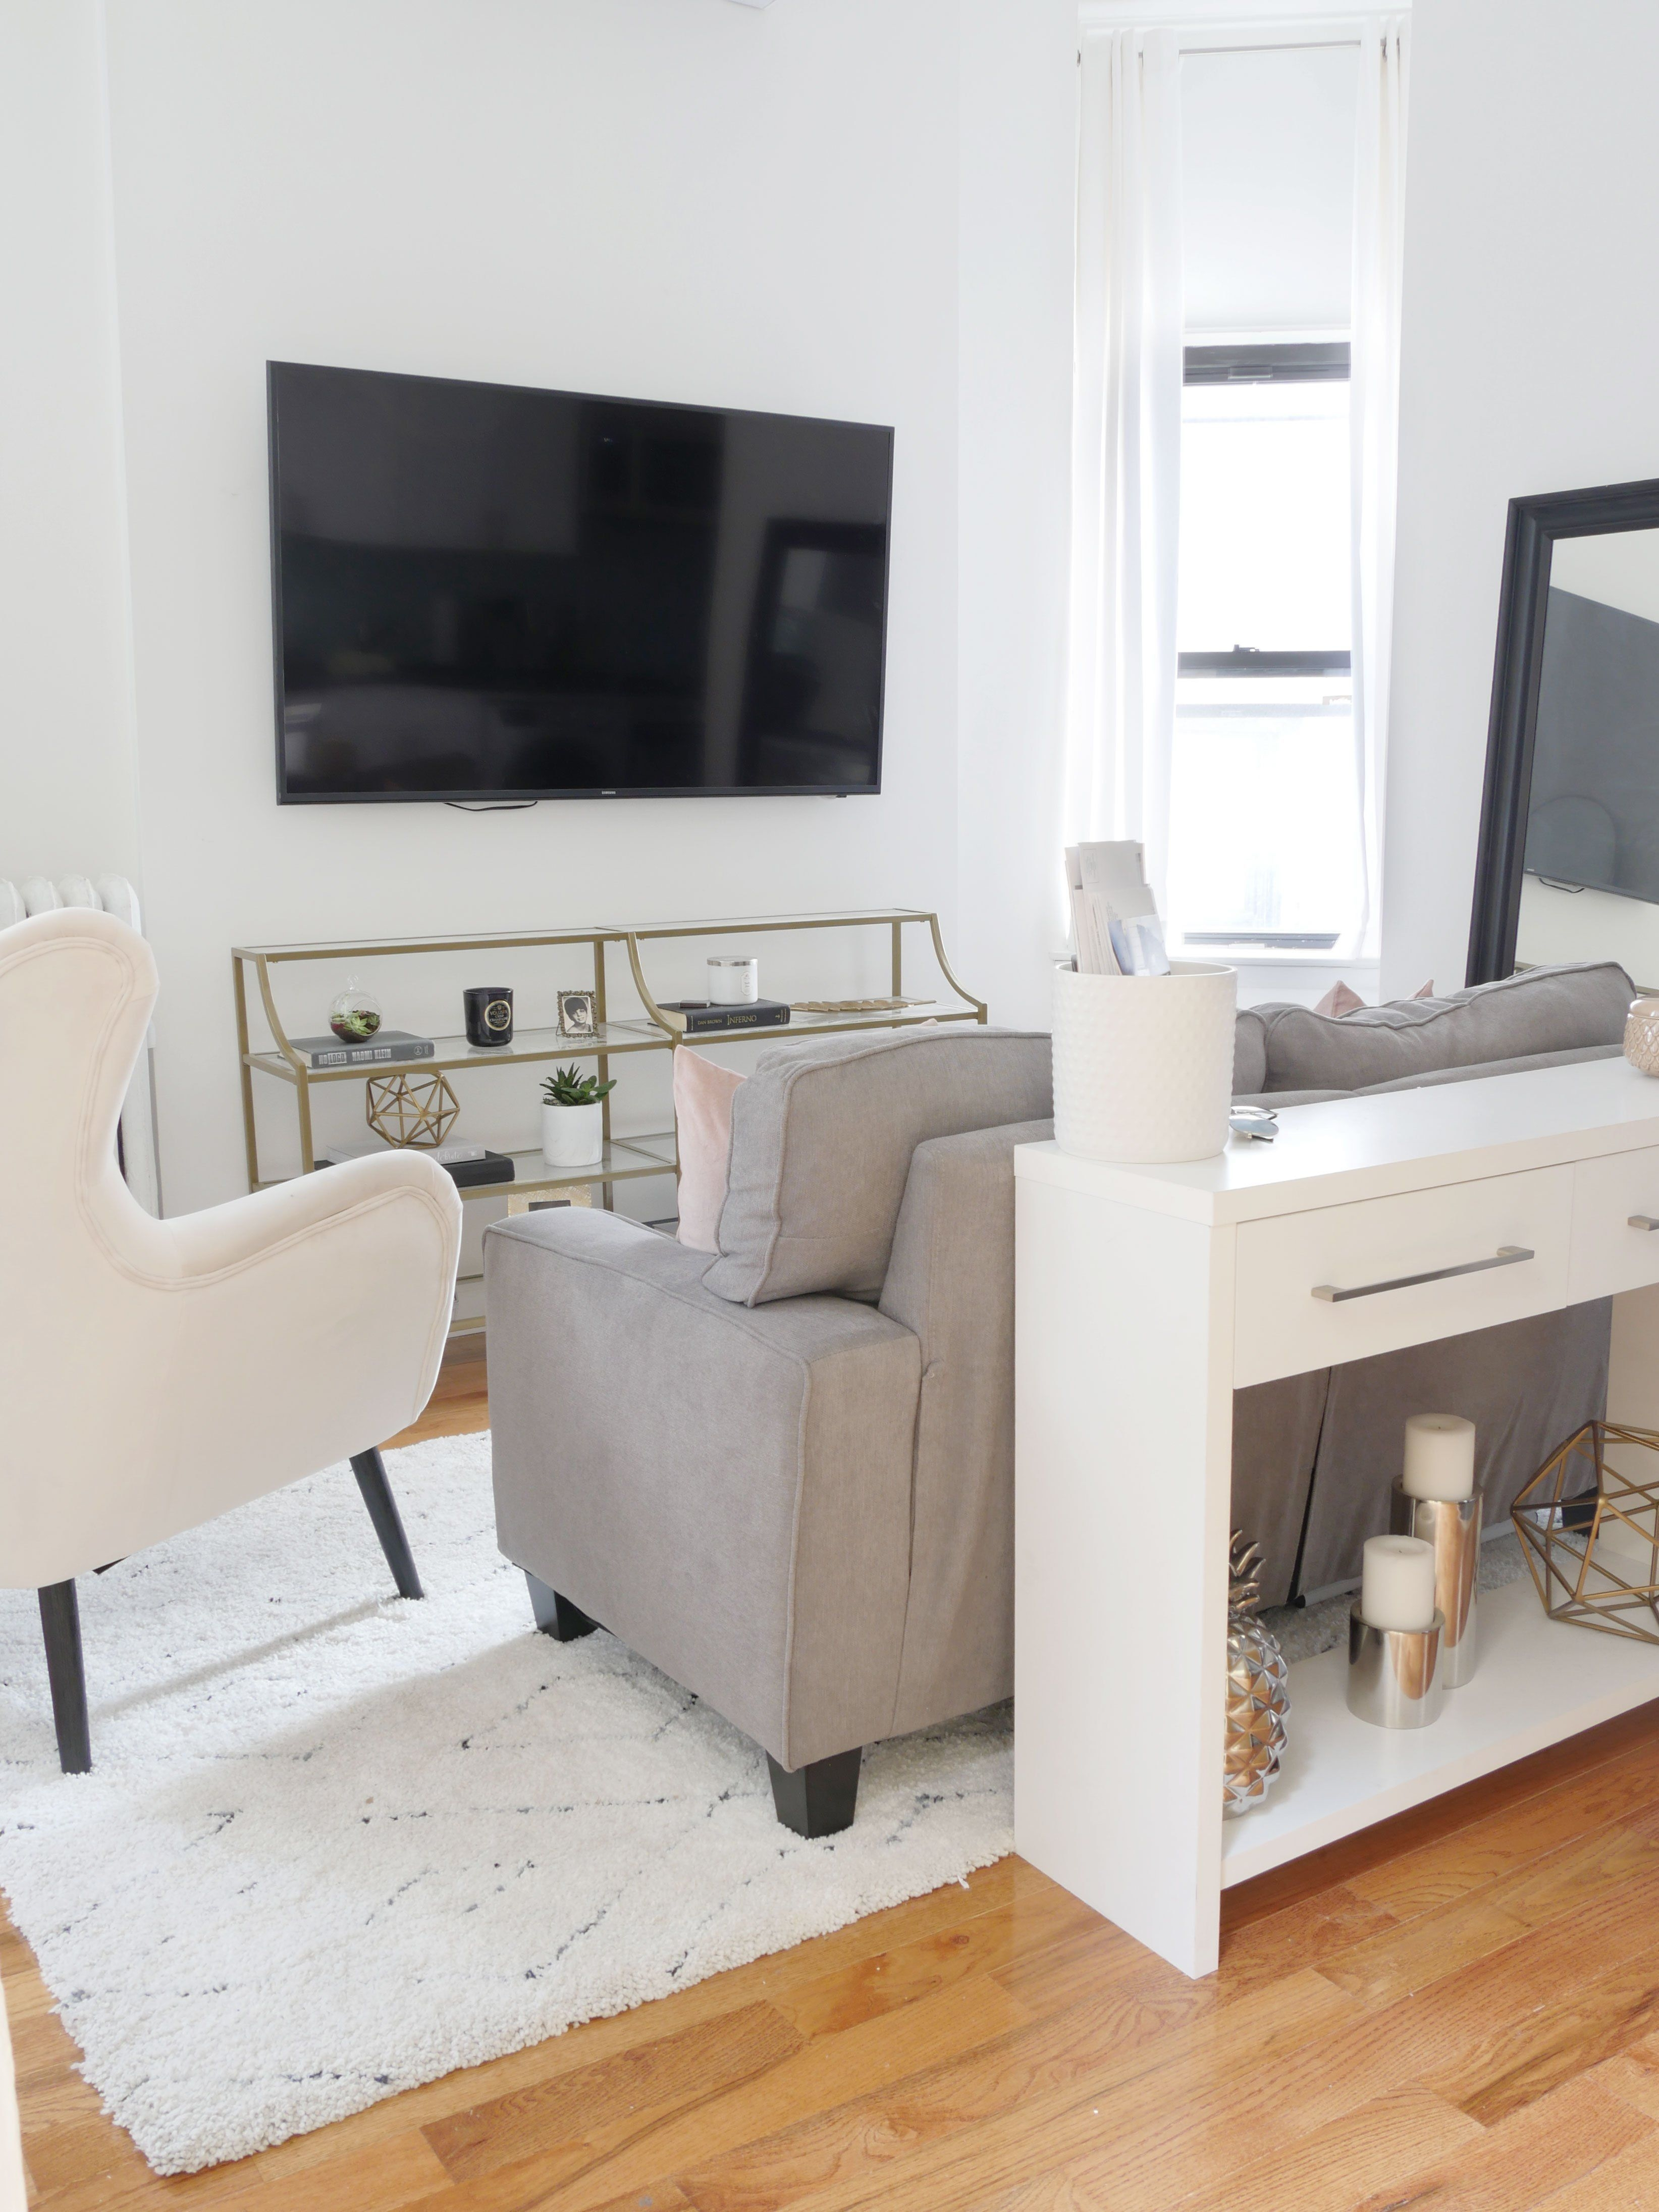 Astonishing Rental Apartment Decorating Ideas 49